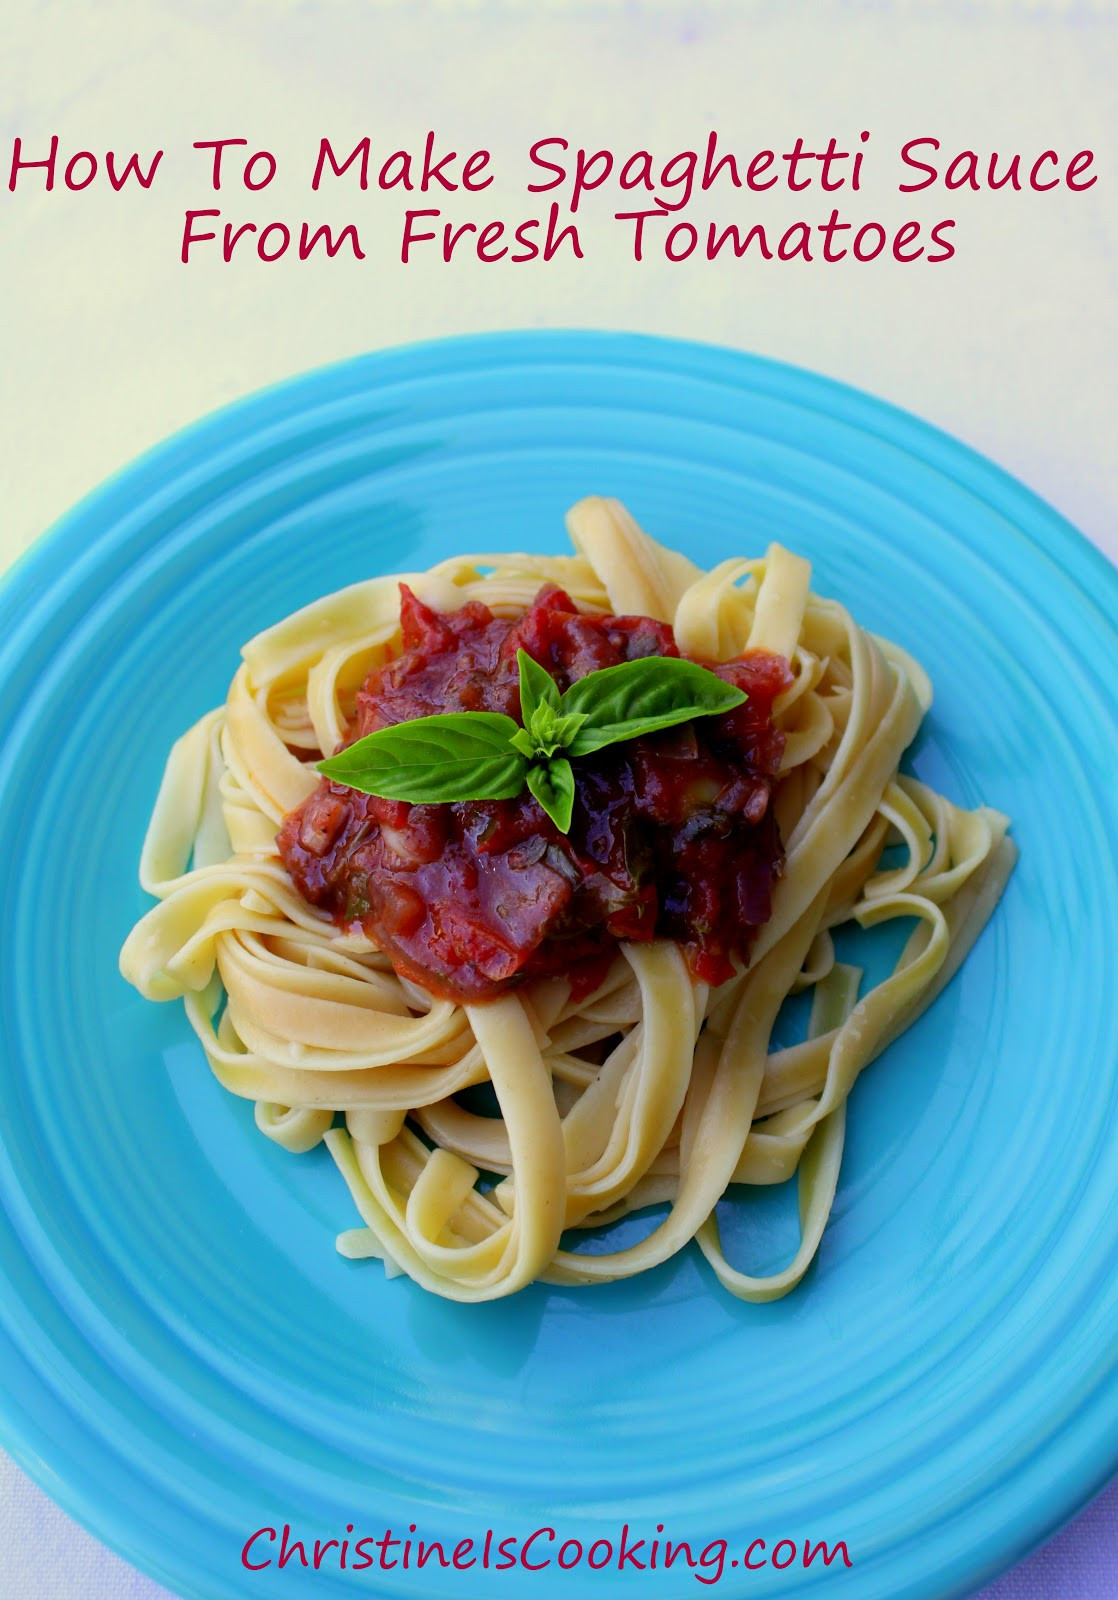 How To Make Spaghetti Sauce With Tomato Sauce  christineiscooking How To Make Spaghetti Sauce From